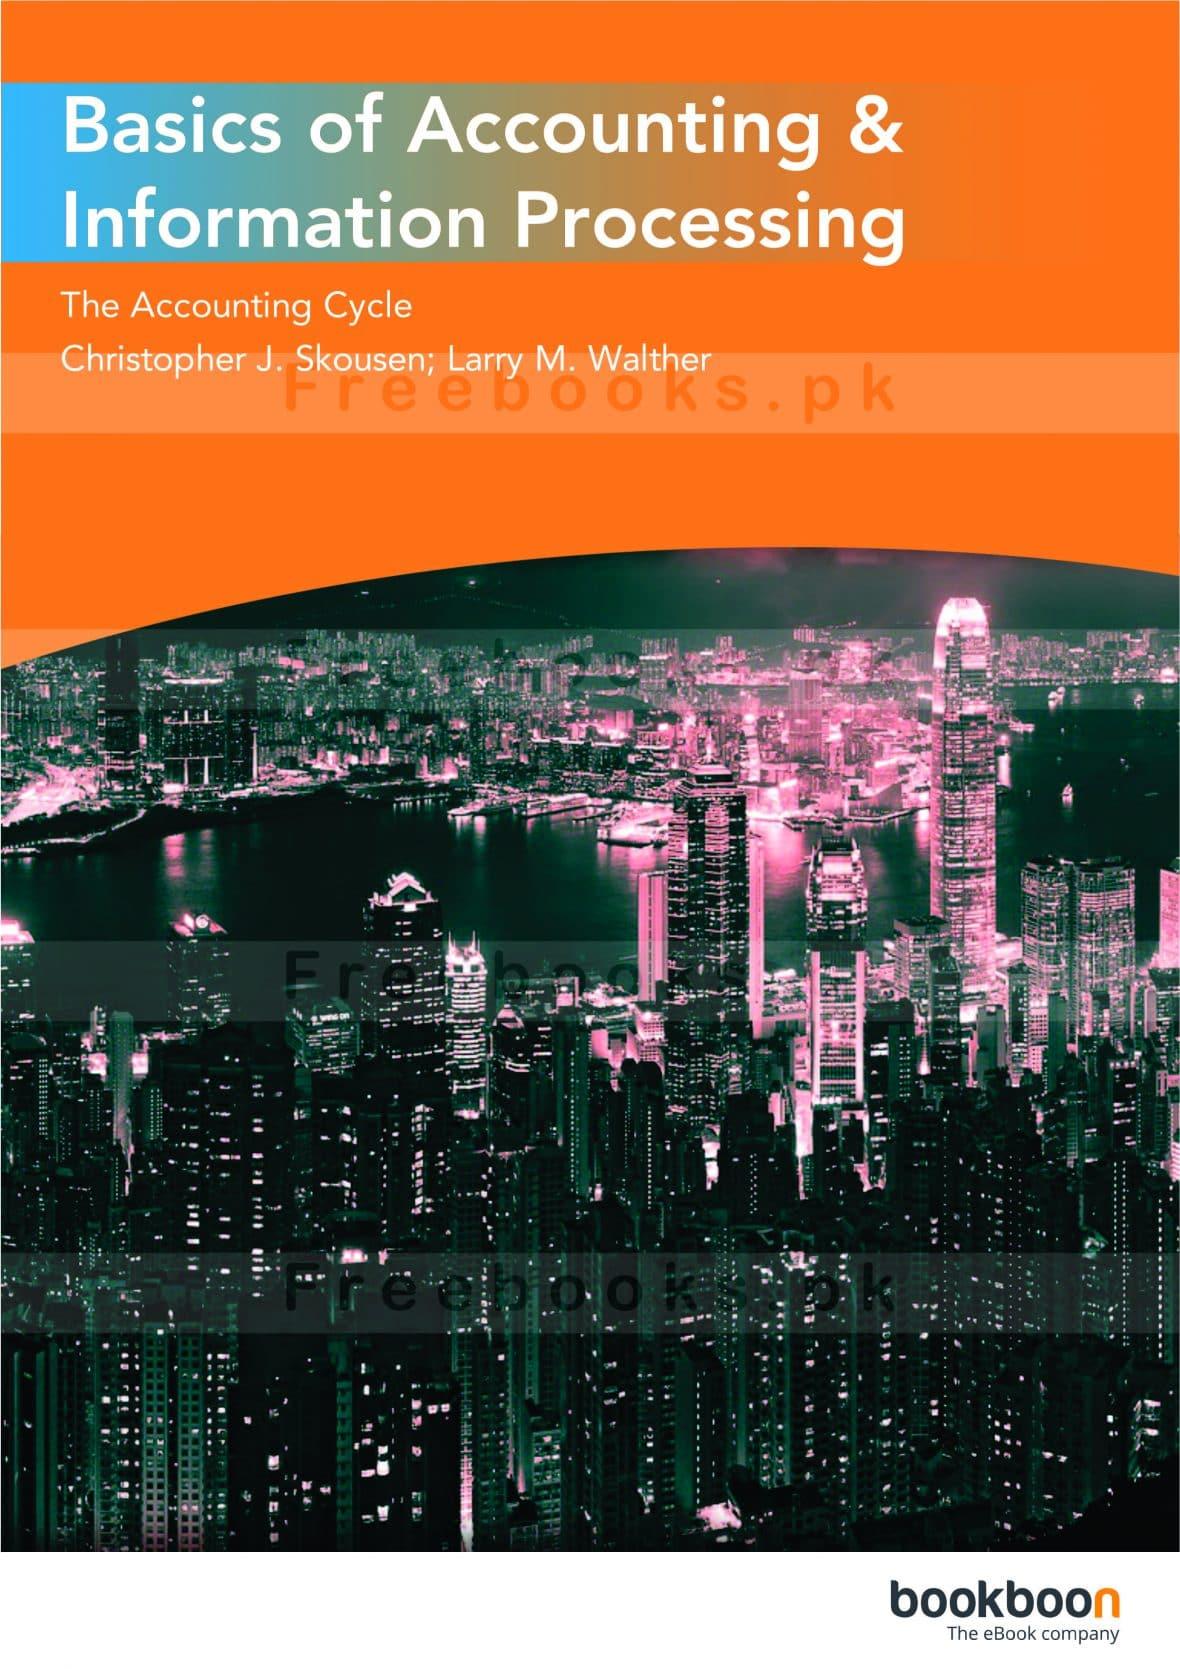 Basics of Accounting & Information Processing